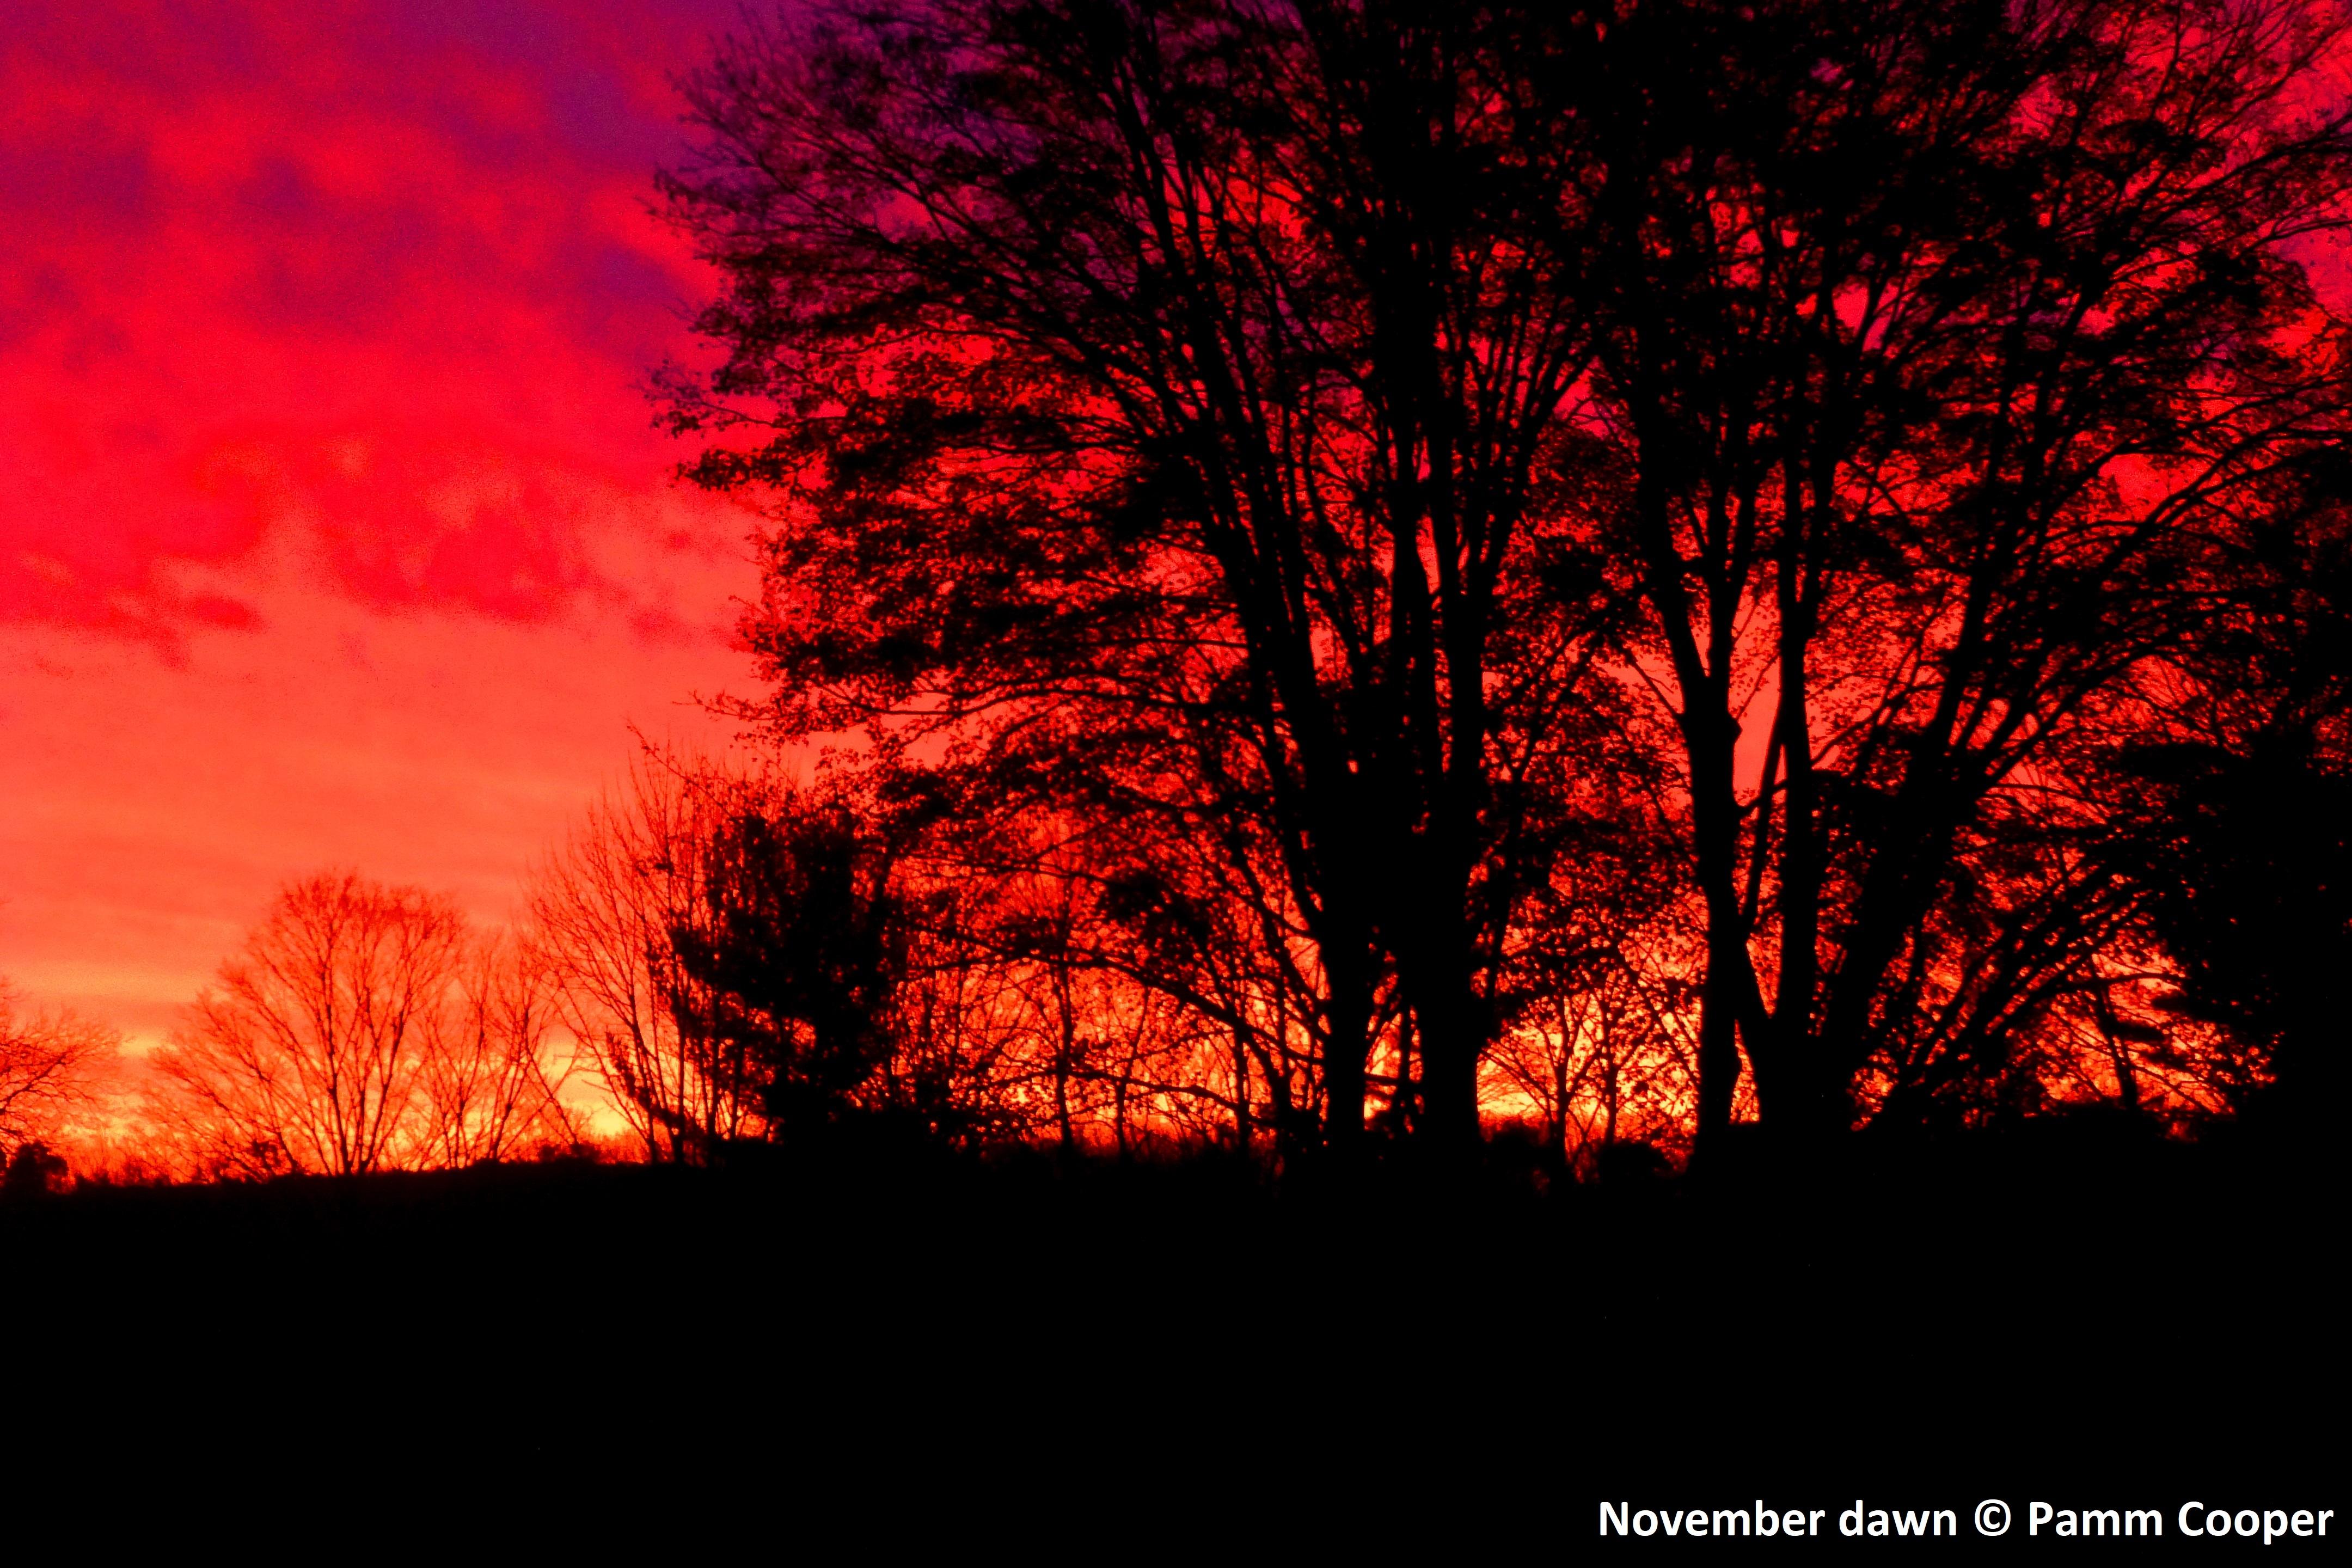 Dawn before the storm November sunrise Pamm Cooper photo